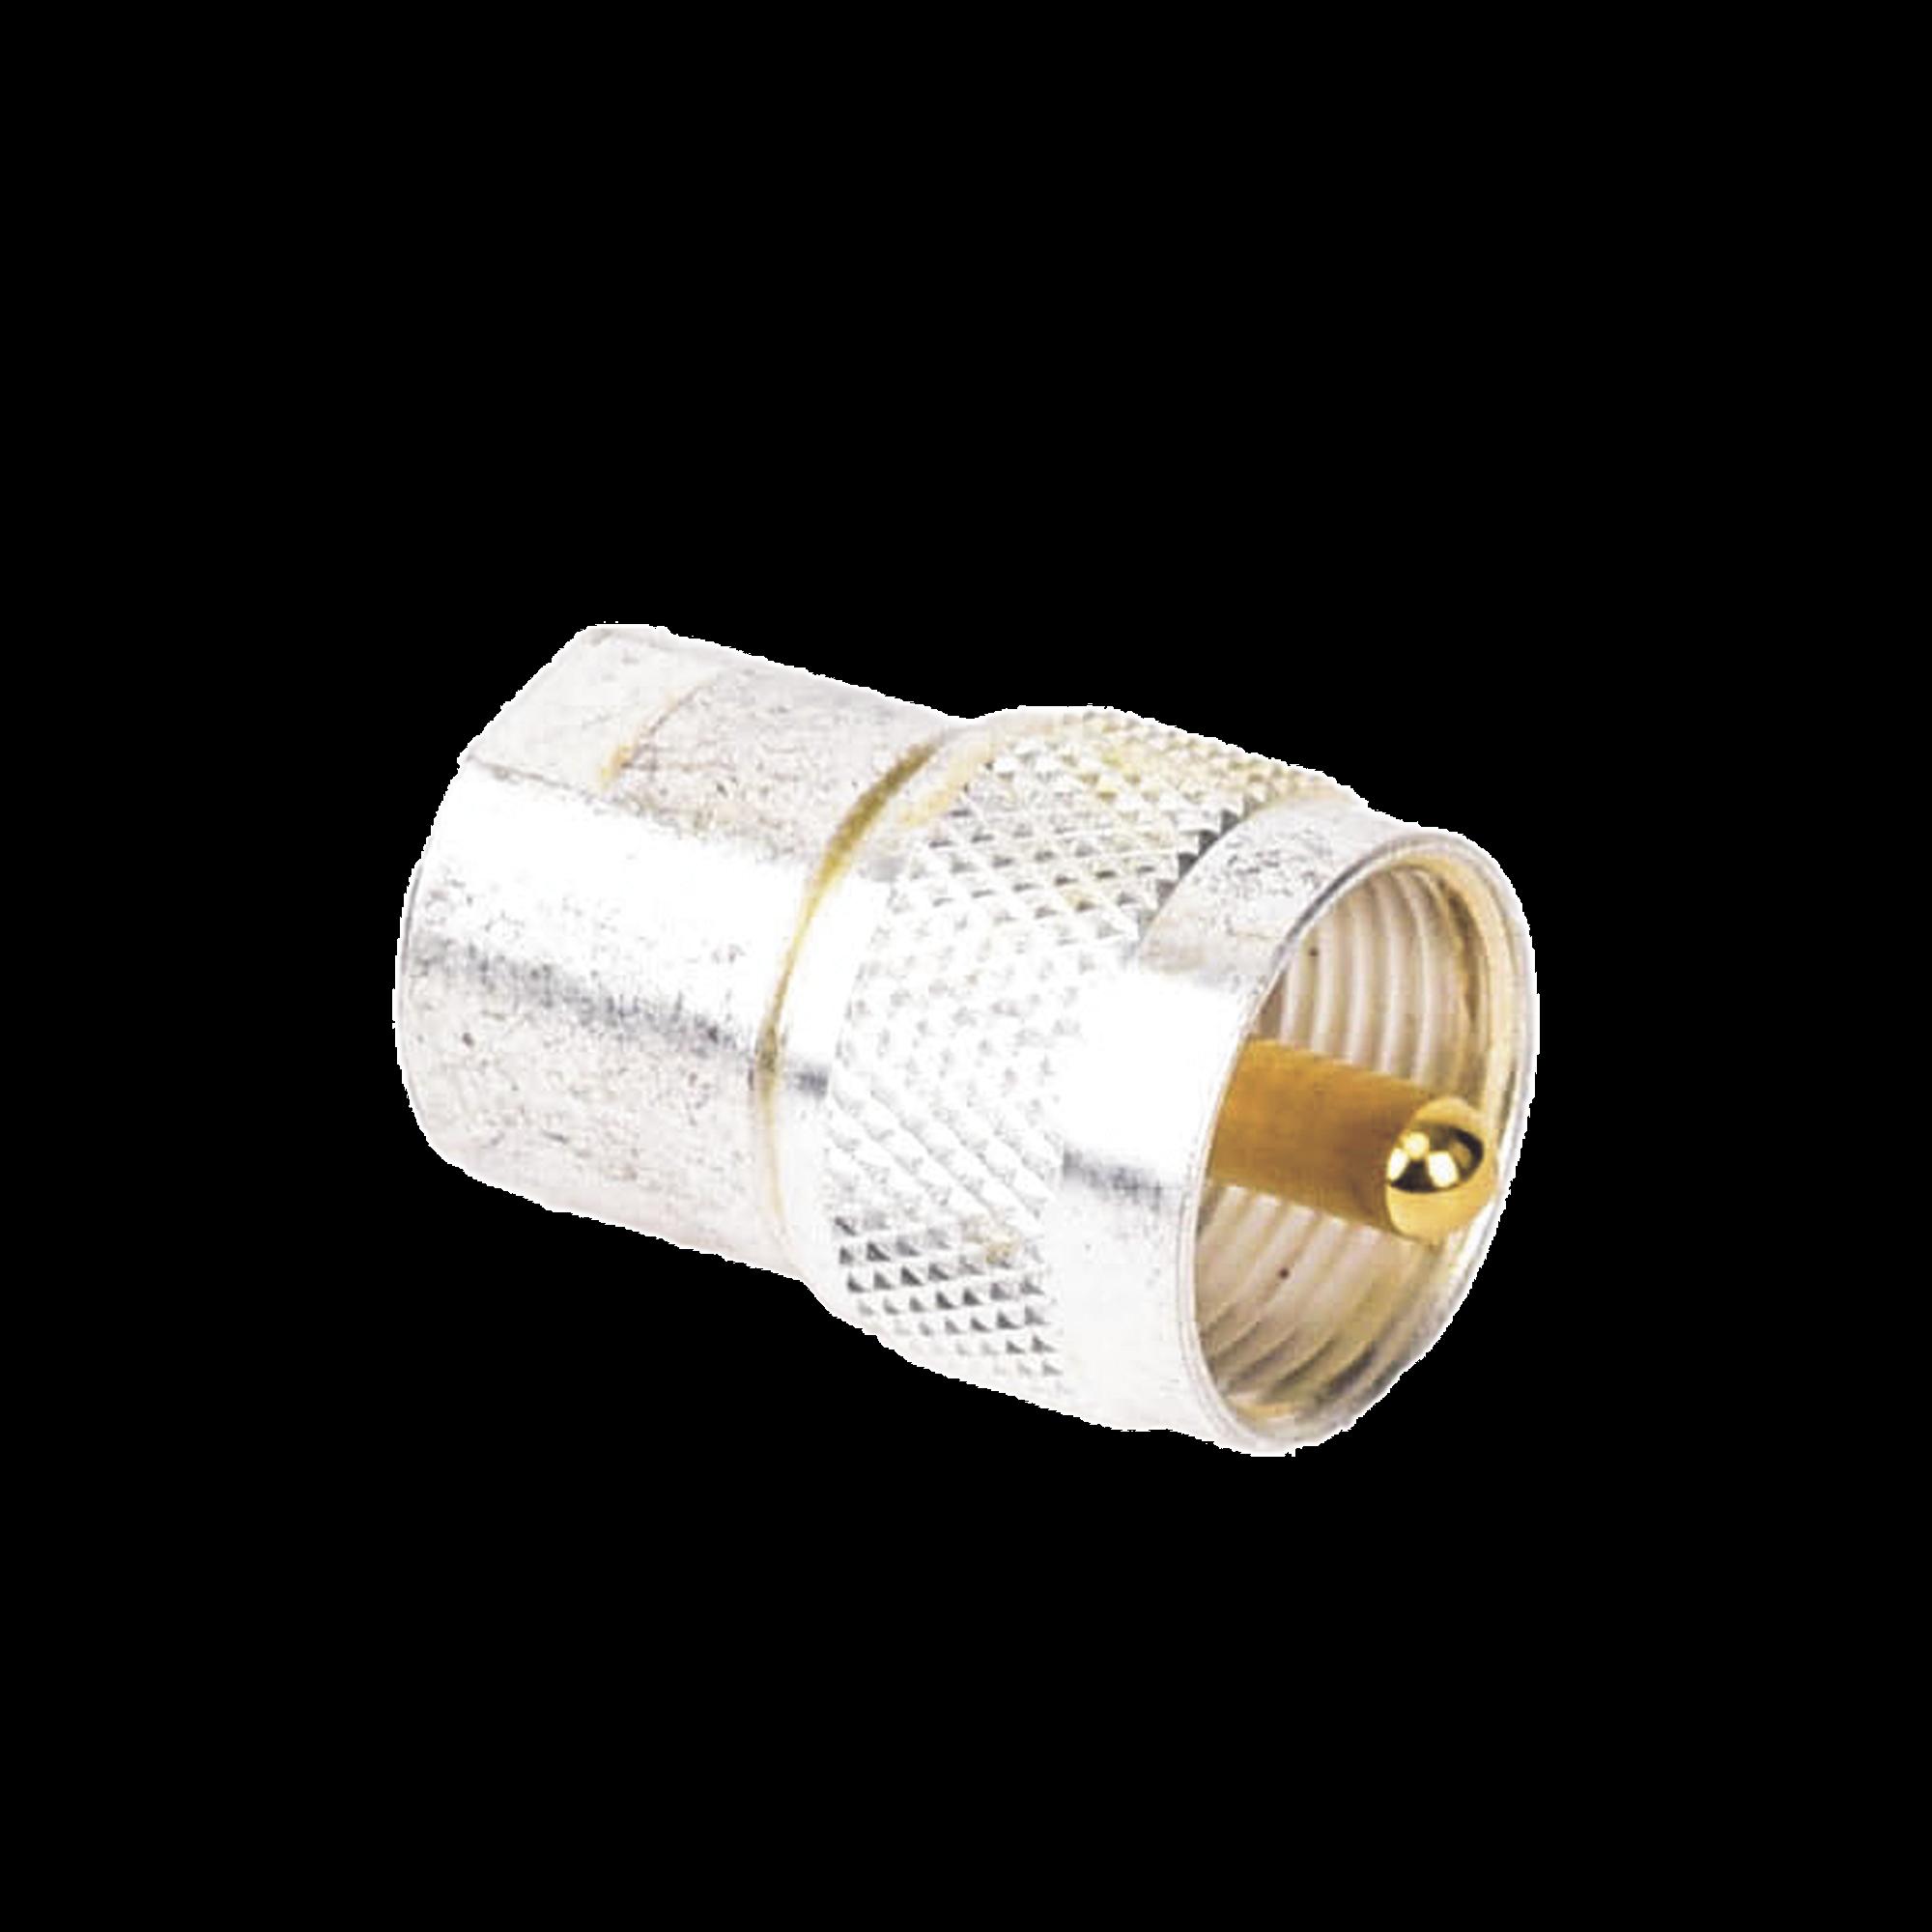 Adaptador UNIDAPT Hembra a UHF Macho (PL-259). Plata / Oro / Teflón.